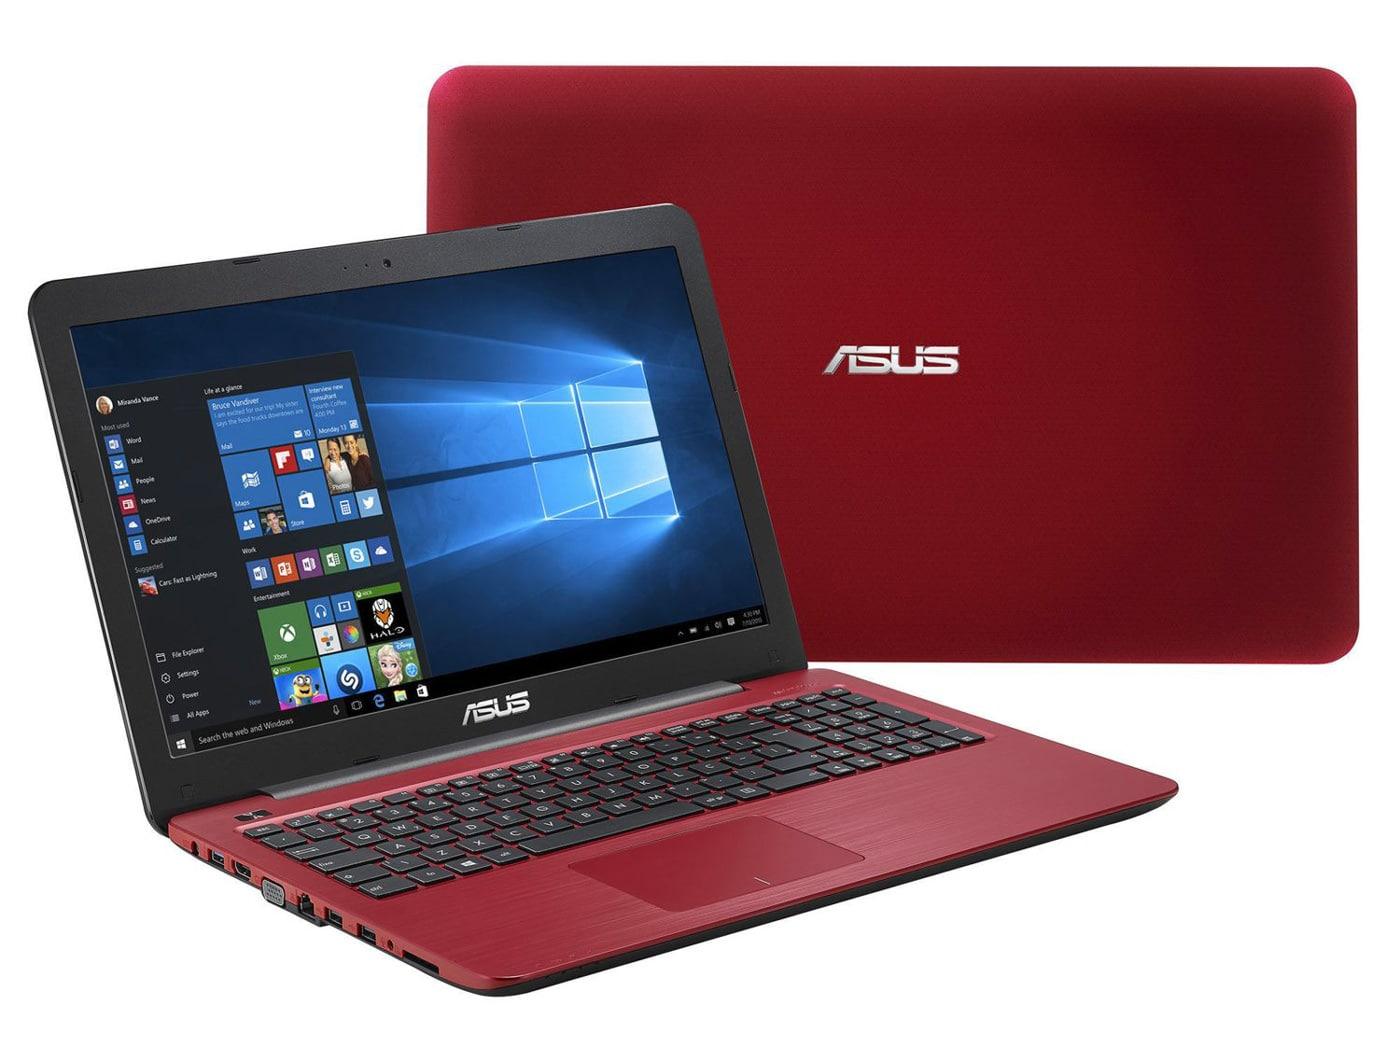 Asus R511LA-XX3011T promo 569€, PC portable 15 pouces SSD+HDD Core i5